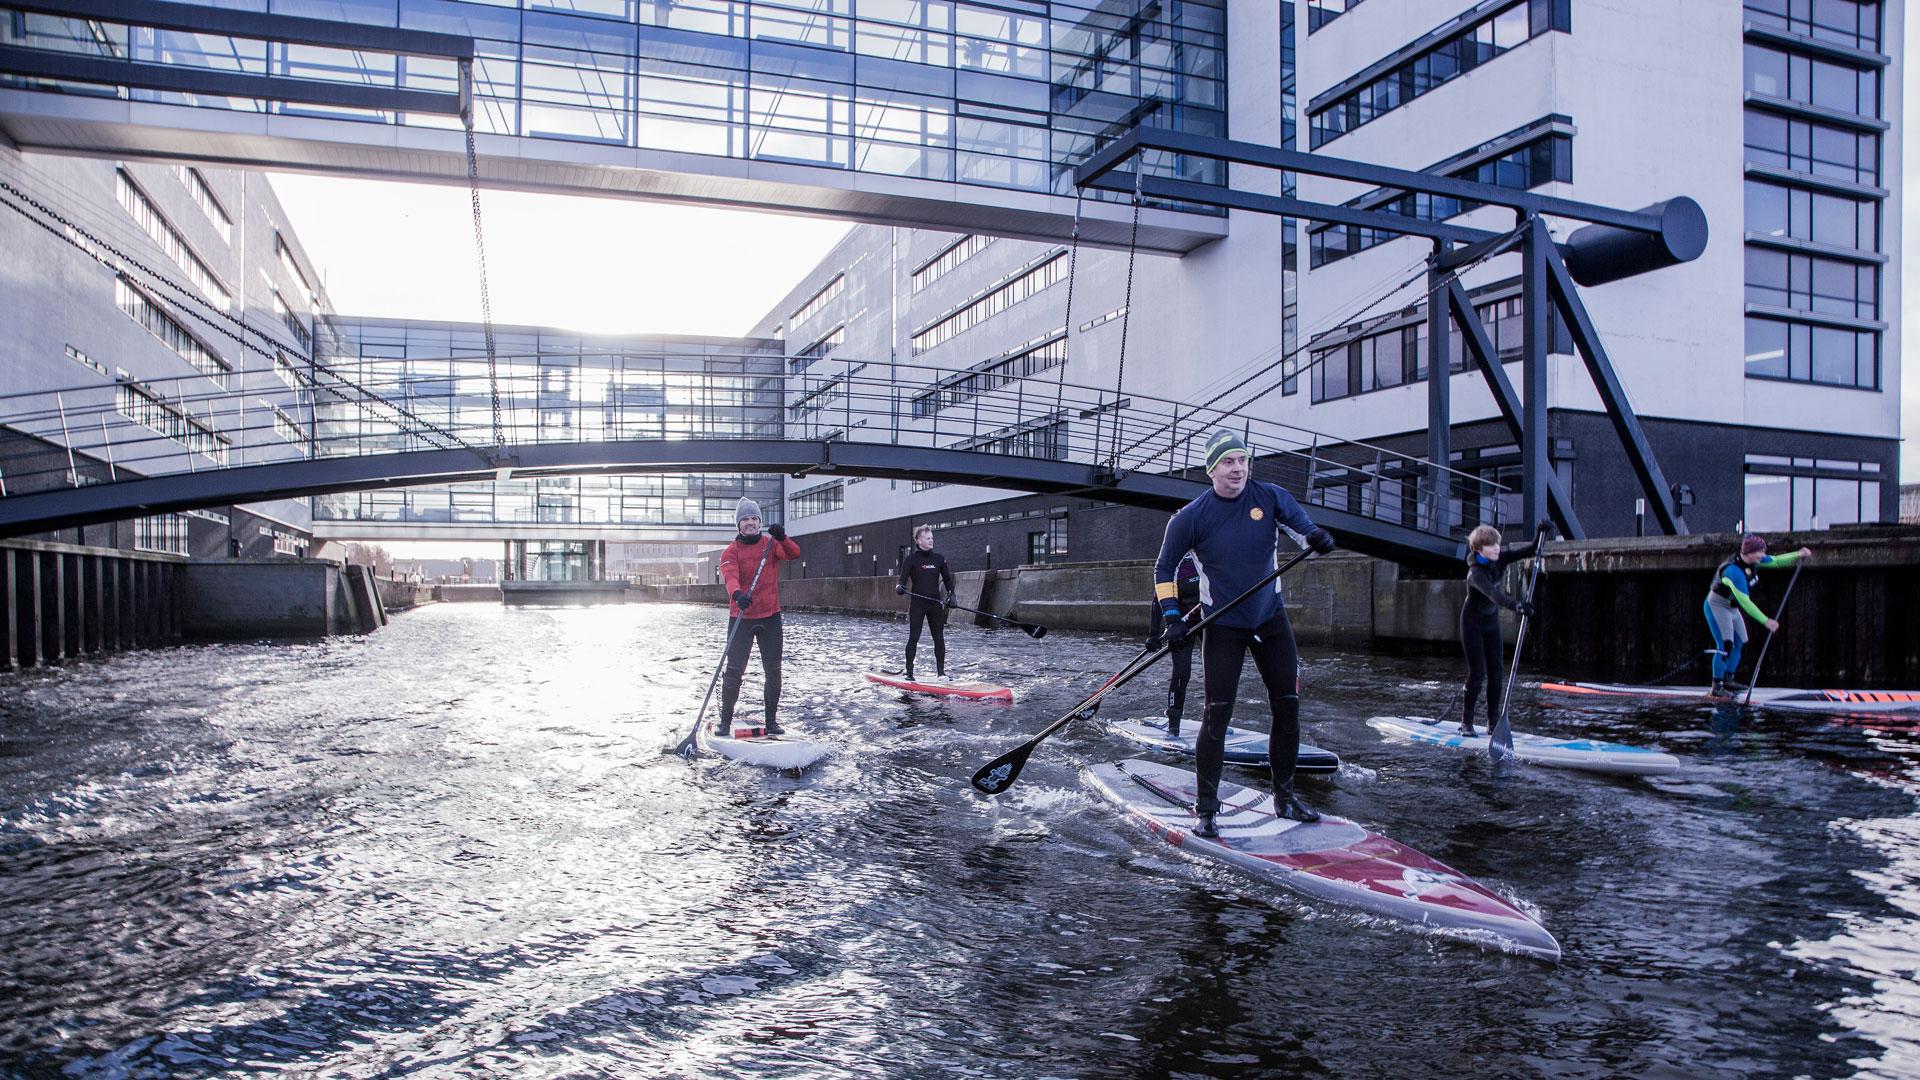 SUP-Safari i Aalborg - image sup-1 on https://www.vildmedvand.dk